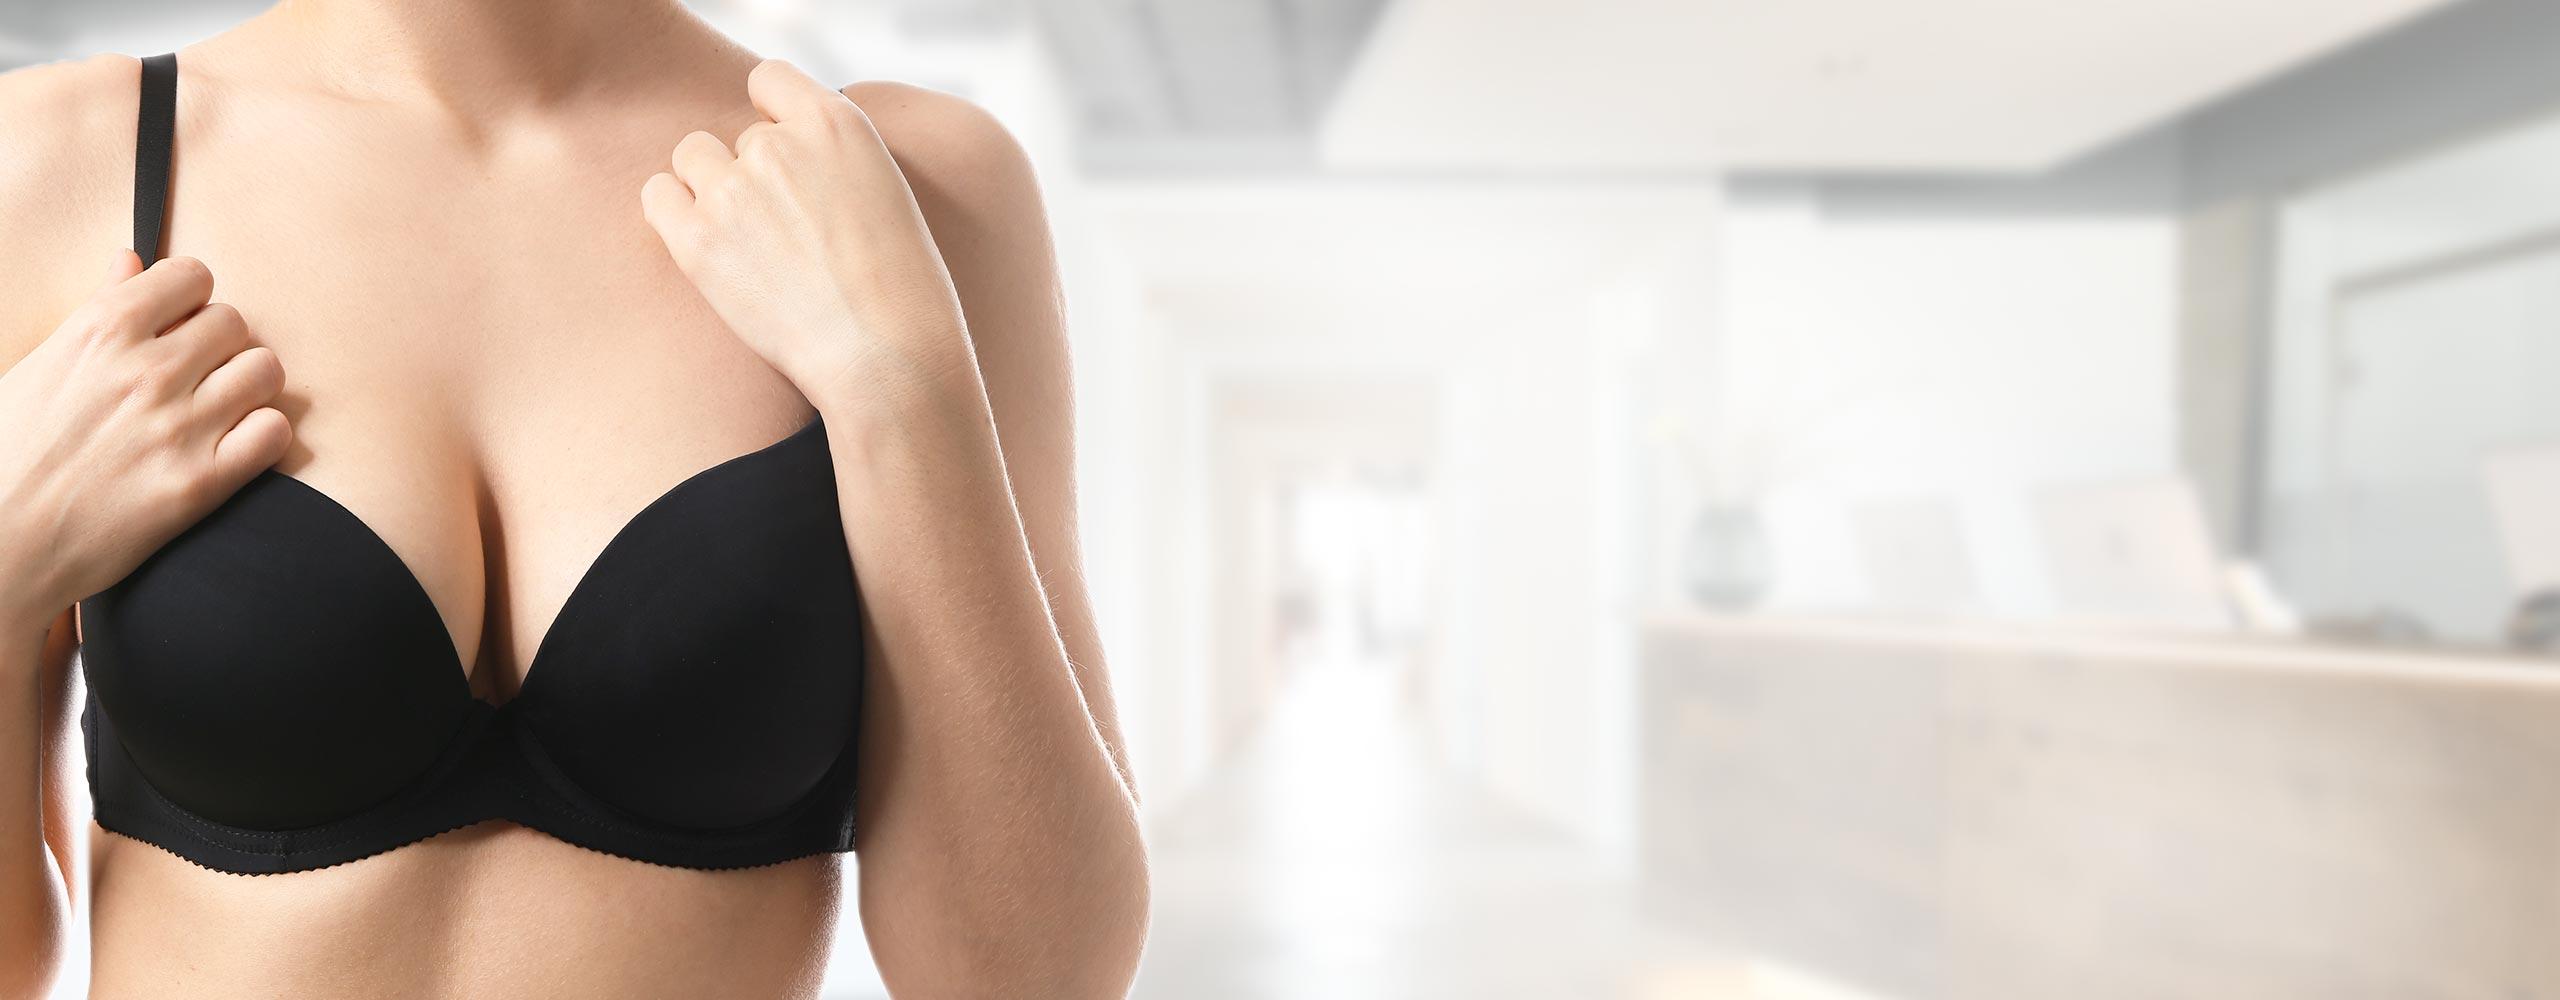 brustvergroesserung schoenheitsklinik proaesthetic header